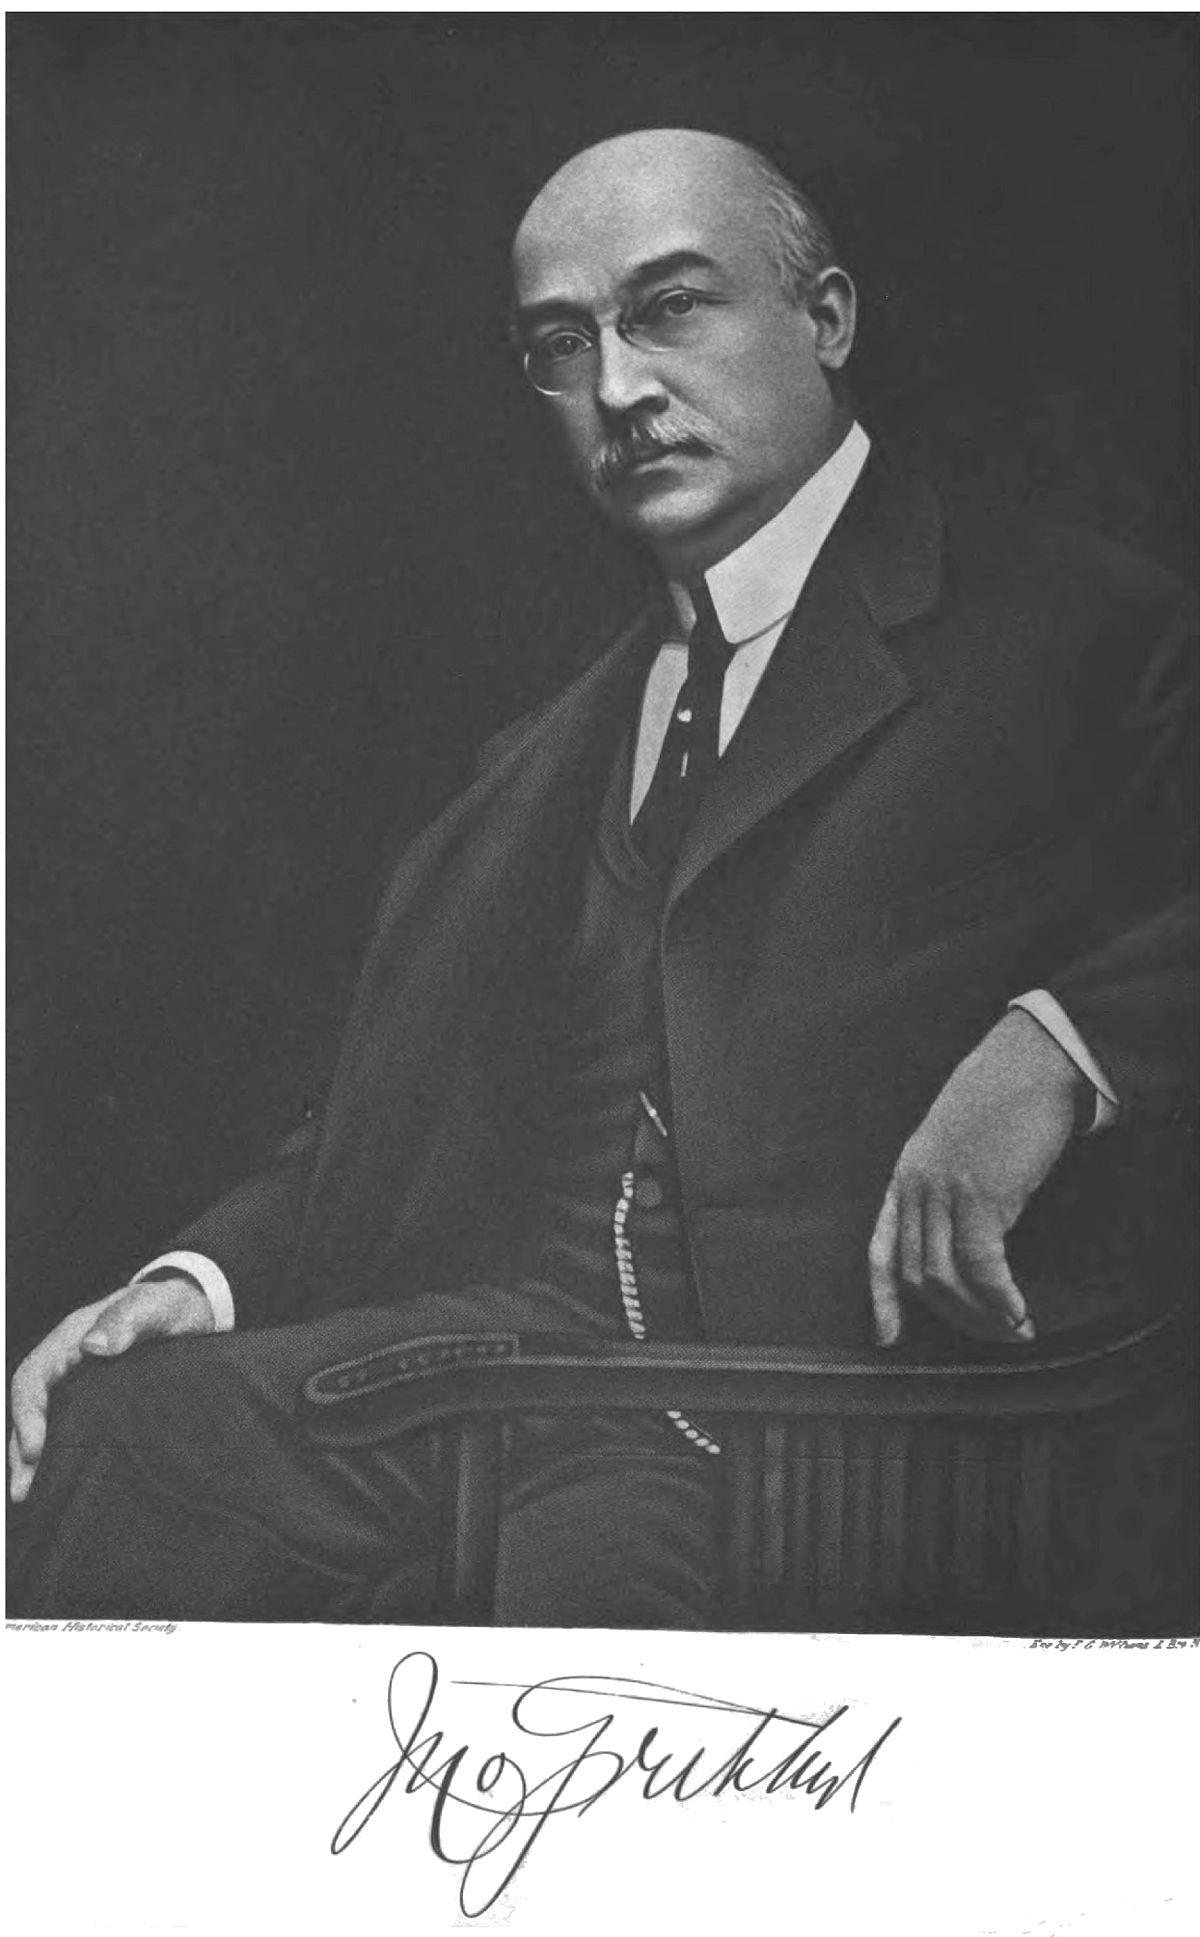 John Gribbel Wikipedia